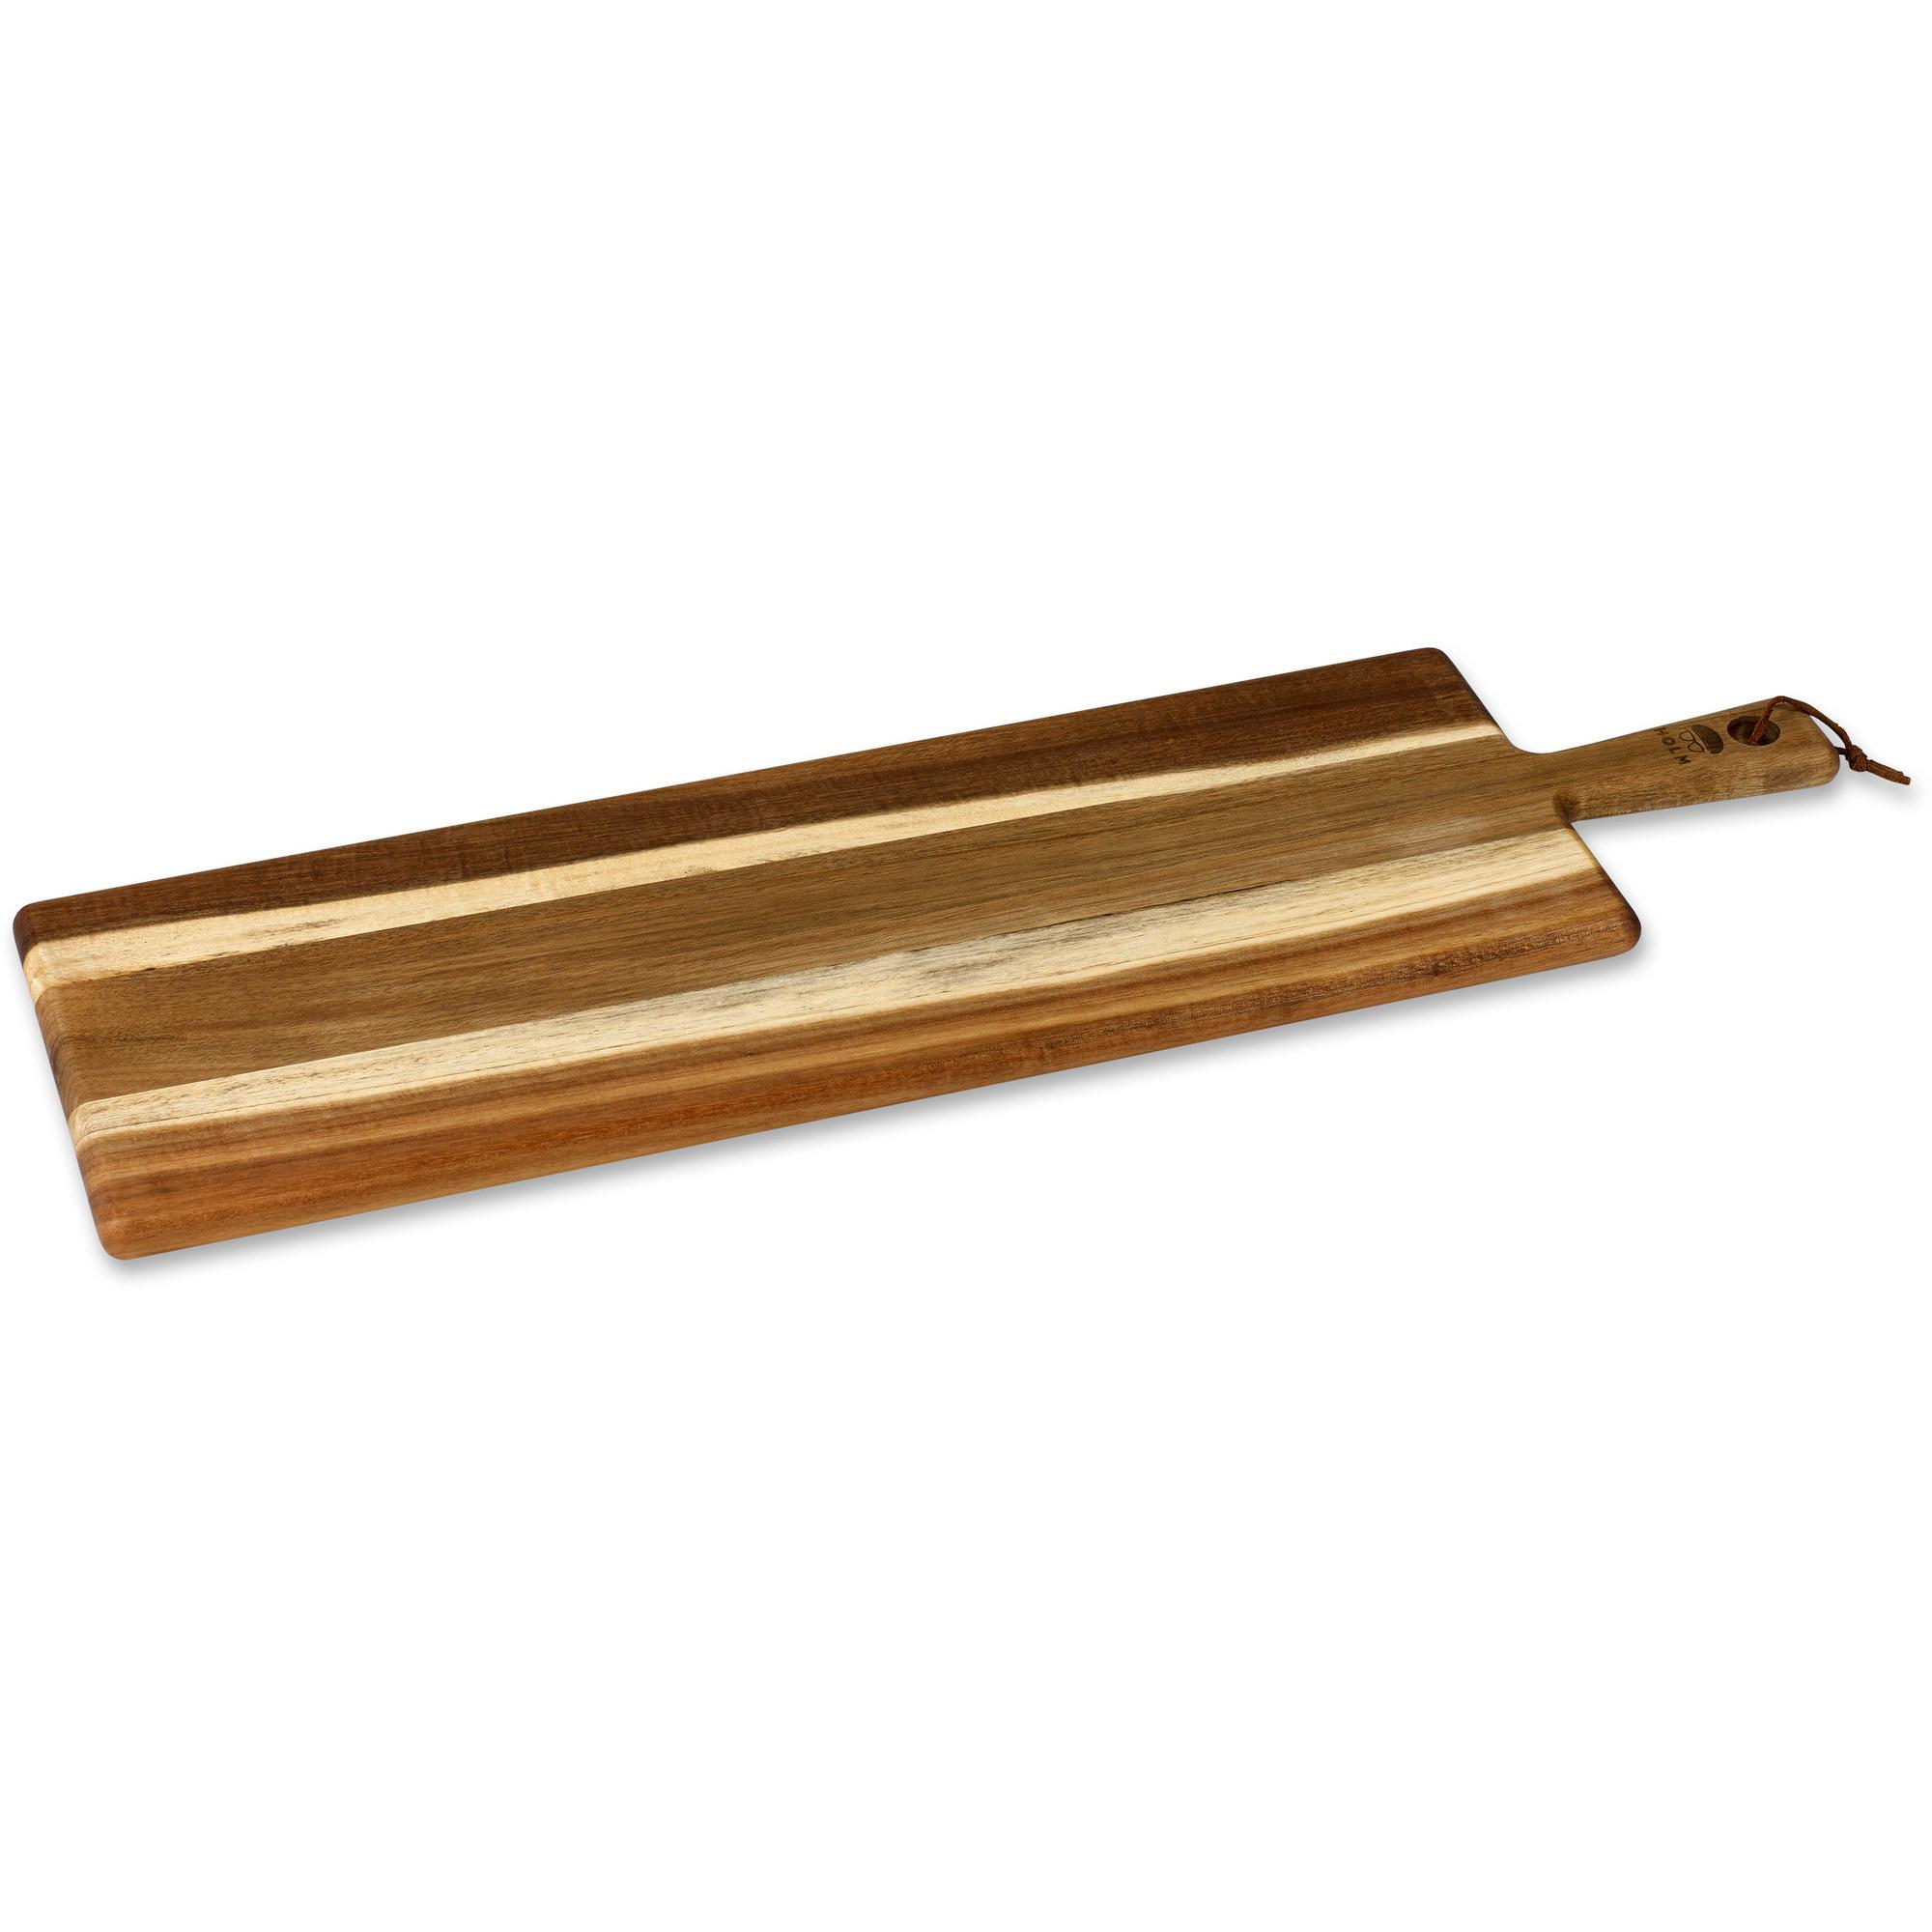 Holm Serveringsbricka 70 x 20 cm.